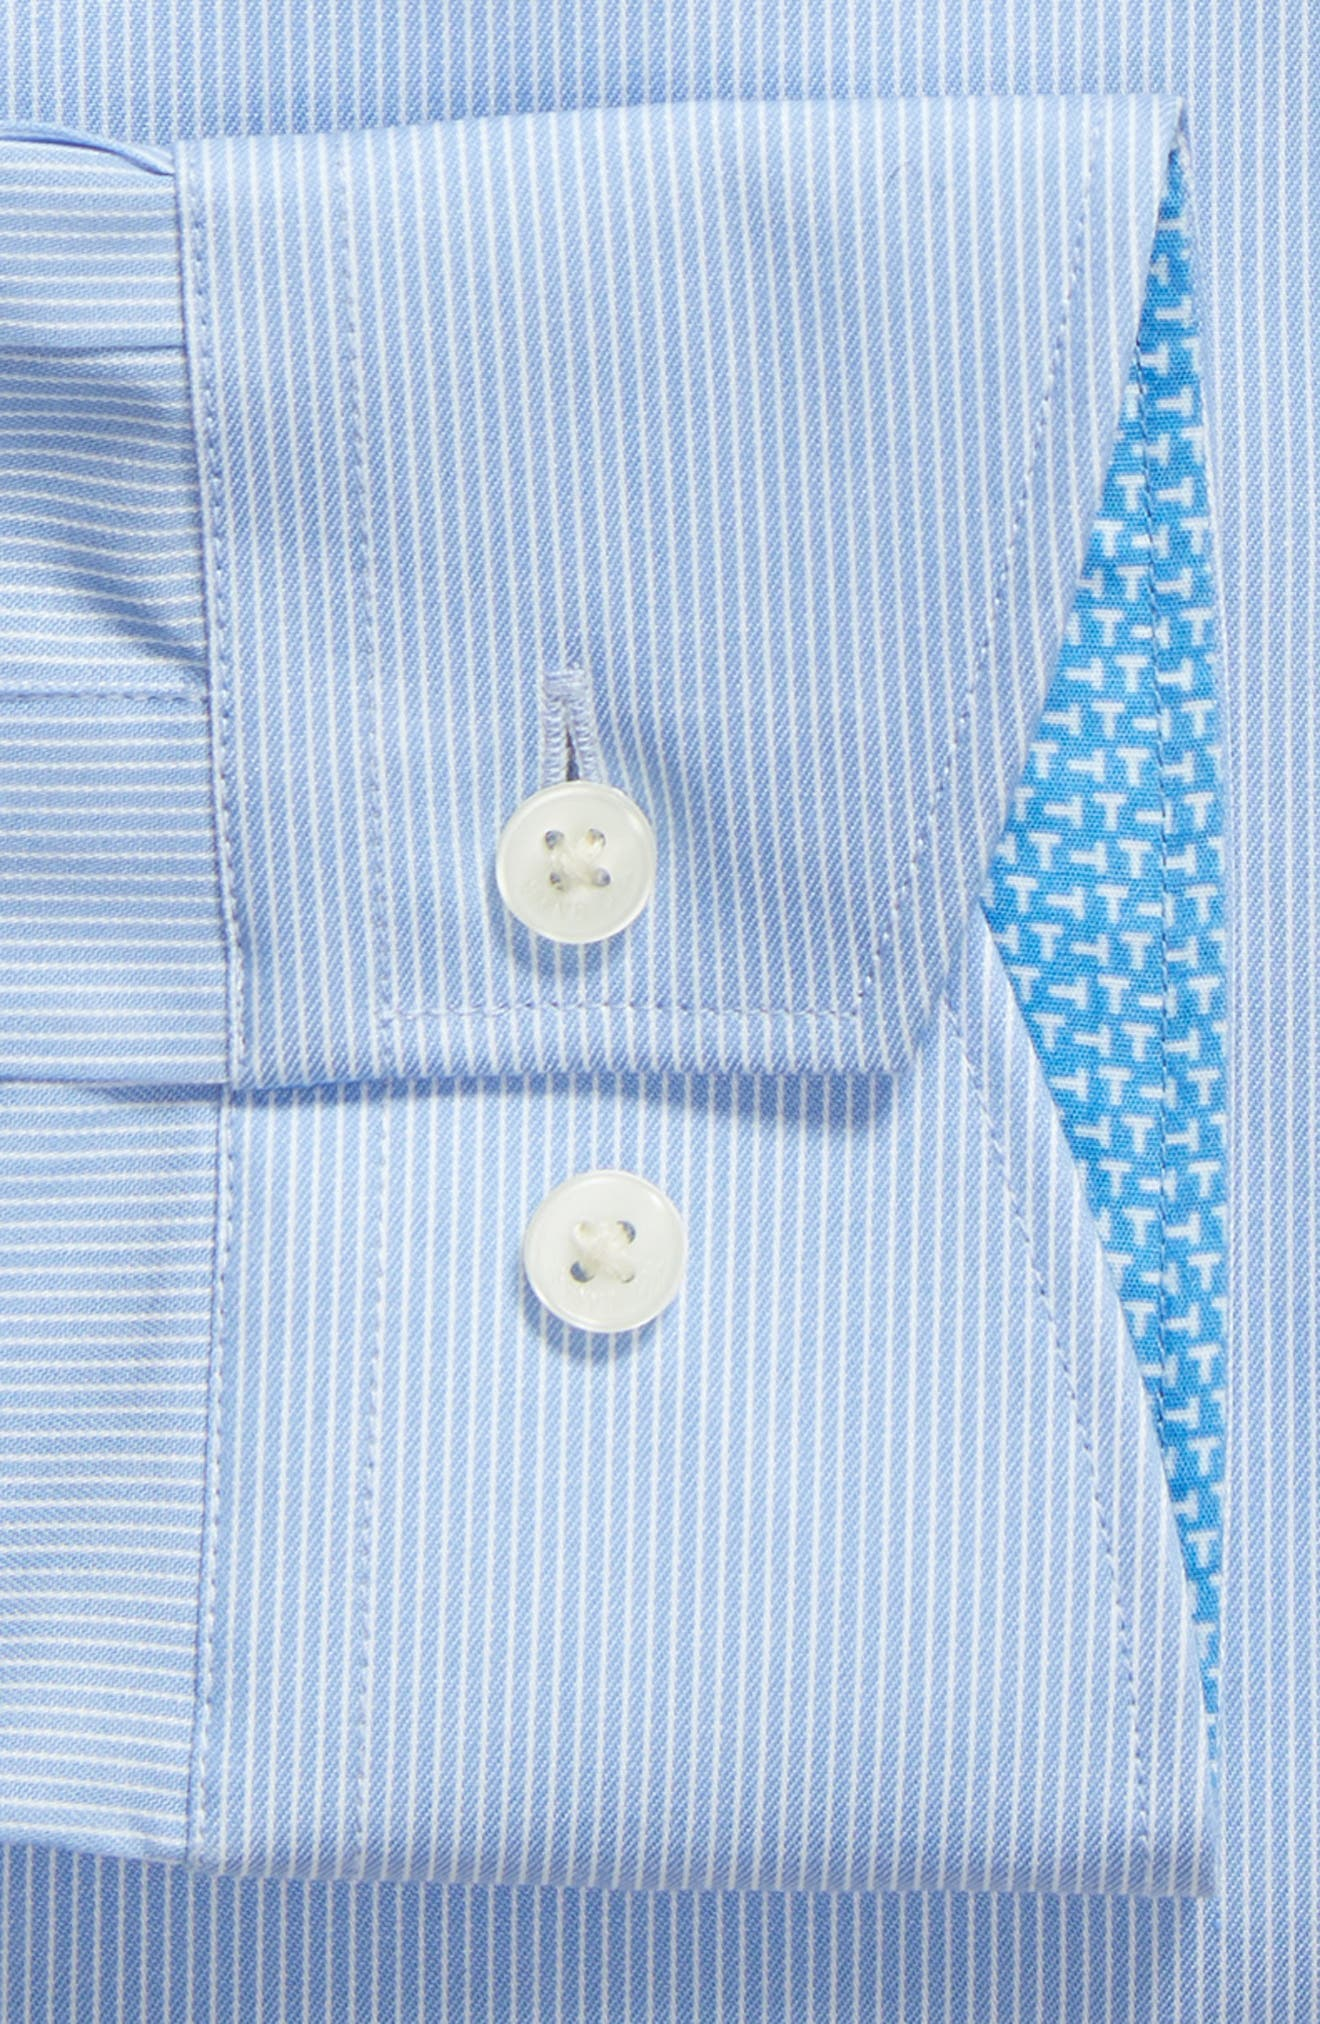 Nickoe Trim Fit Dress Shirt,                             Alternate thumbnail 6, color,                             BLUE